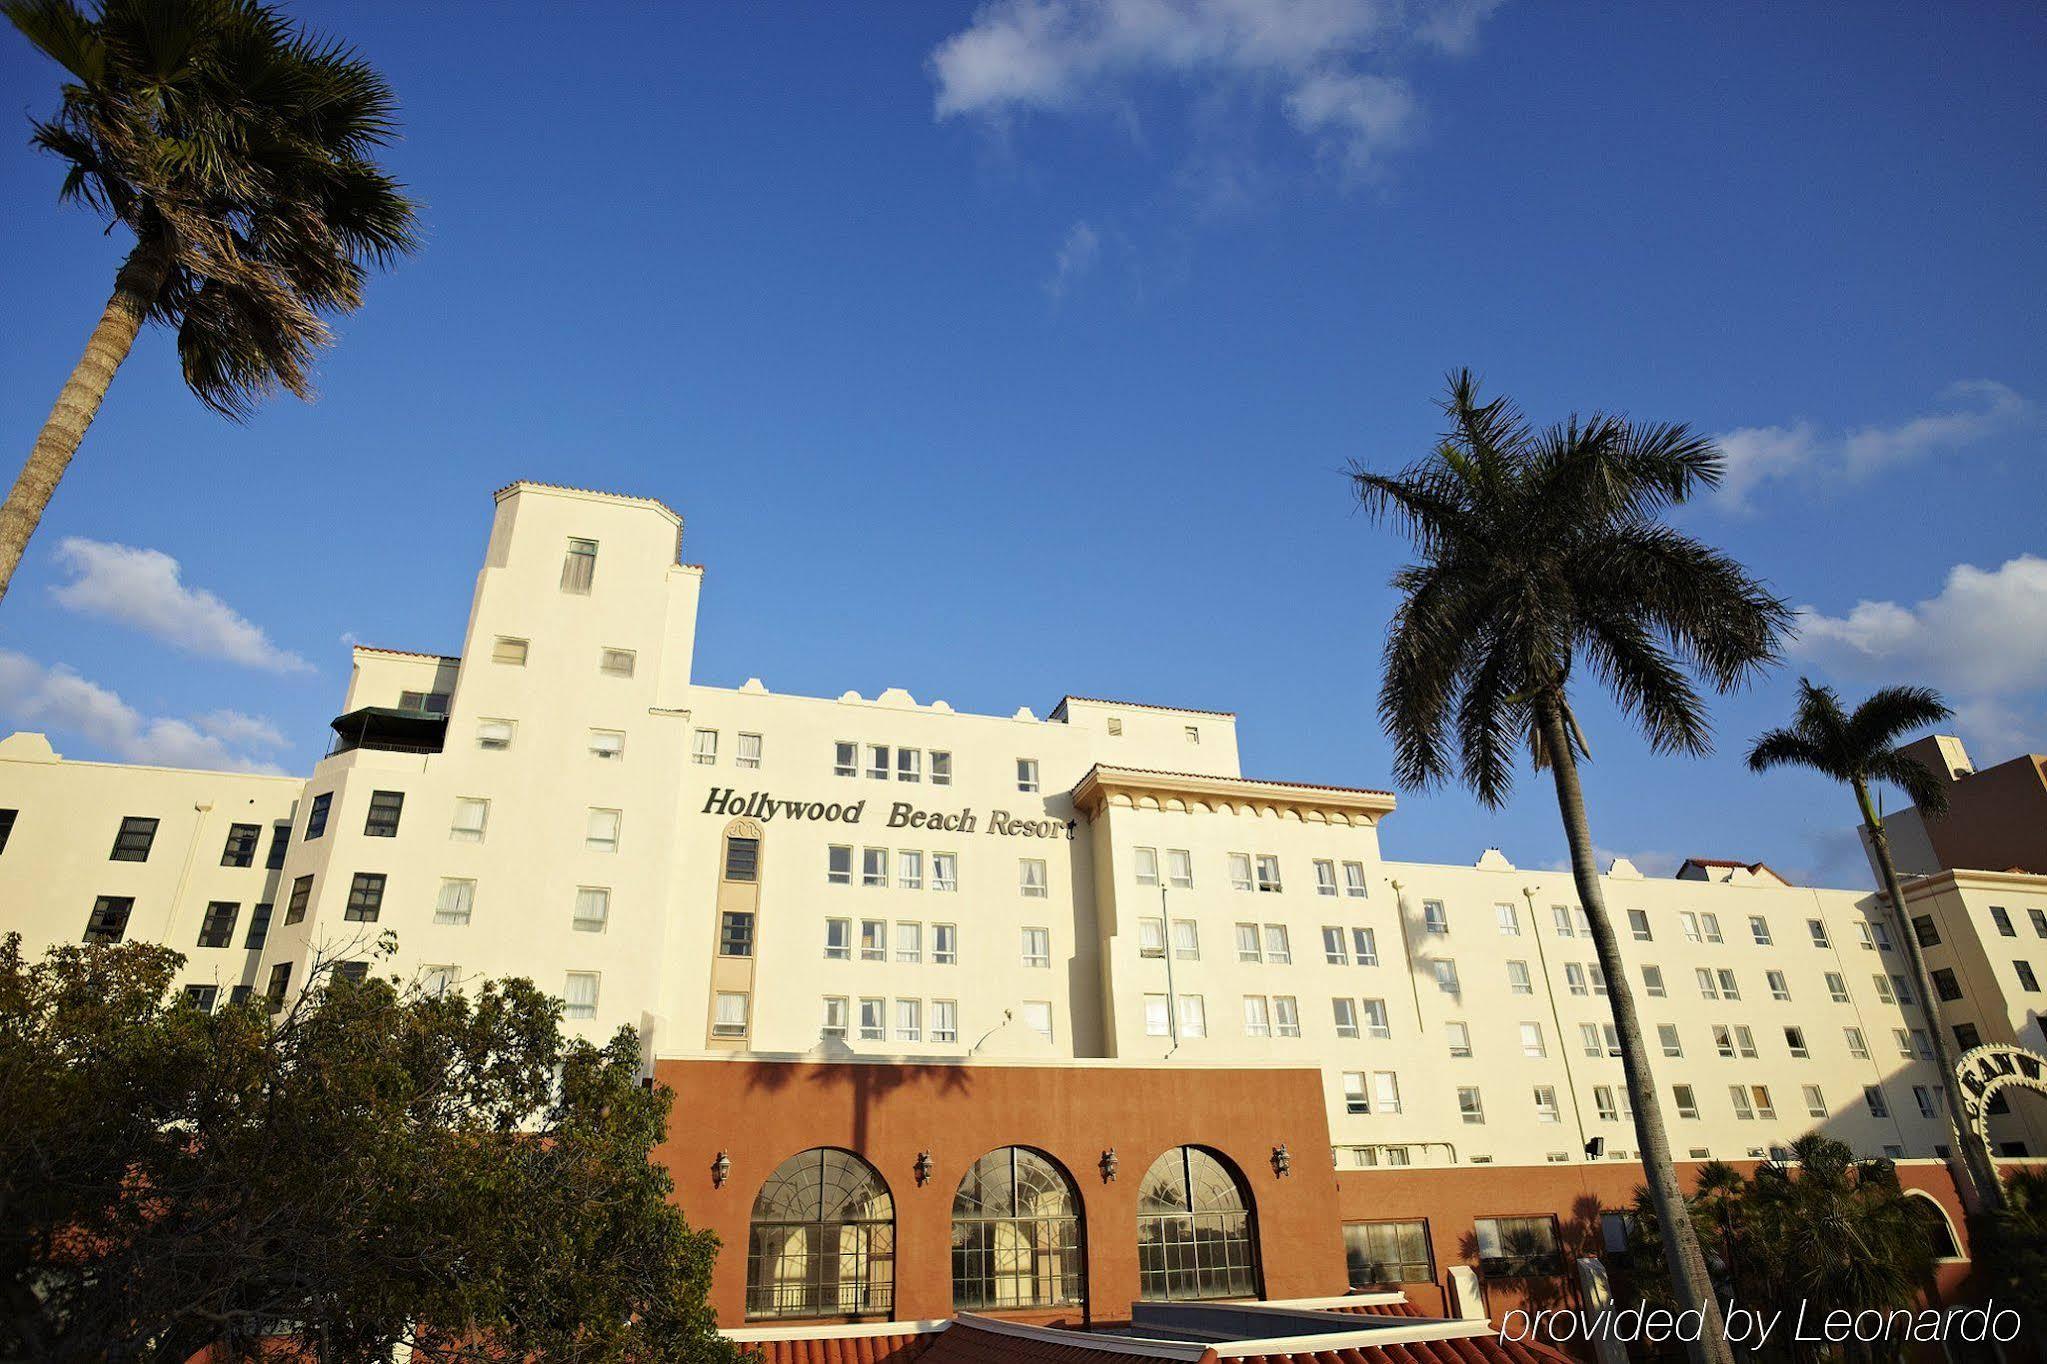 Historic Hollywood Beach Resort